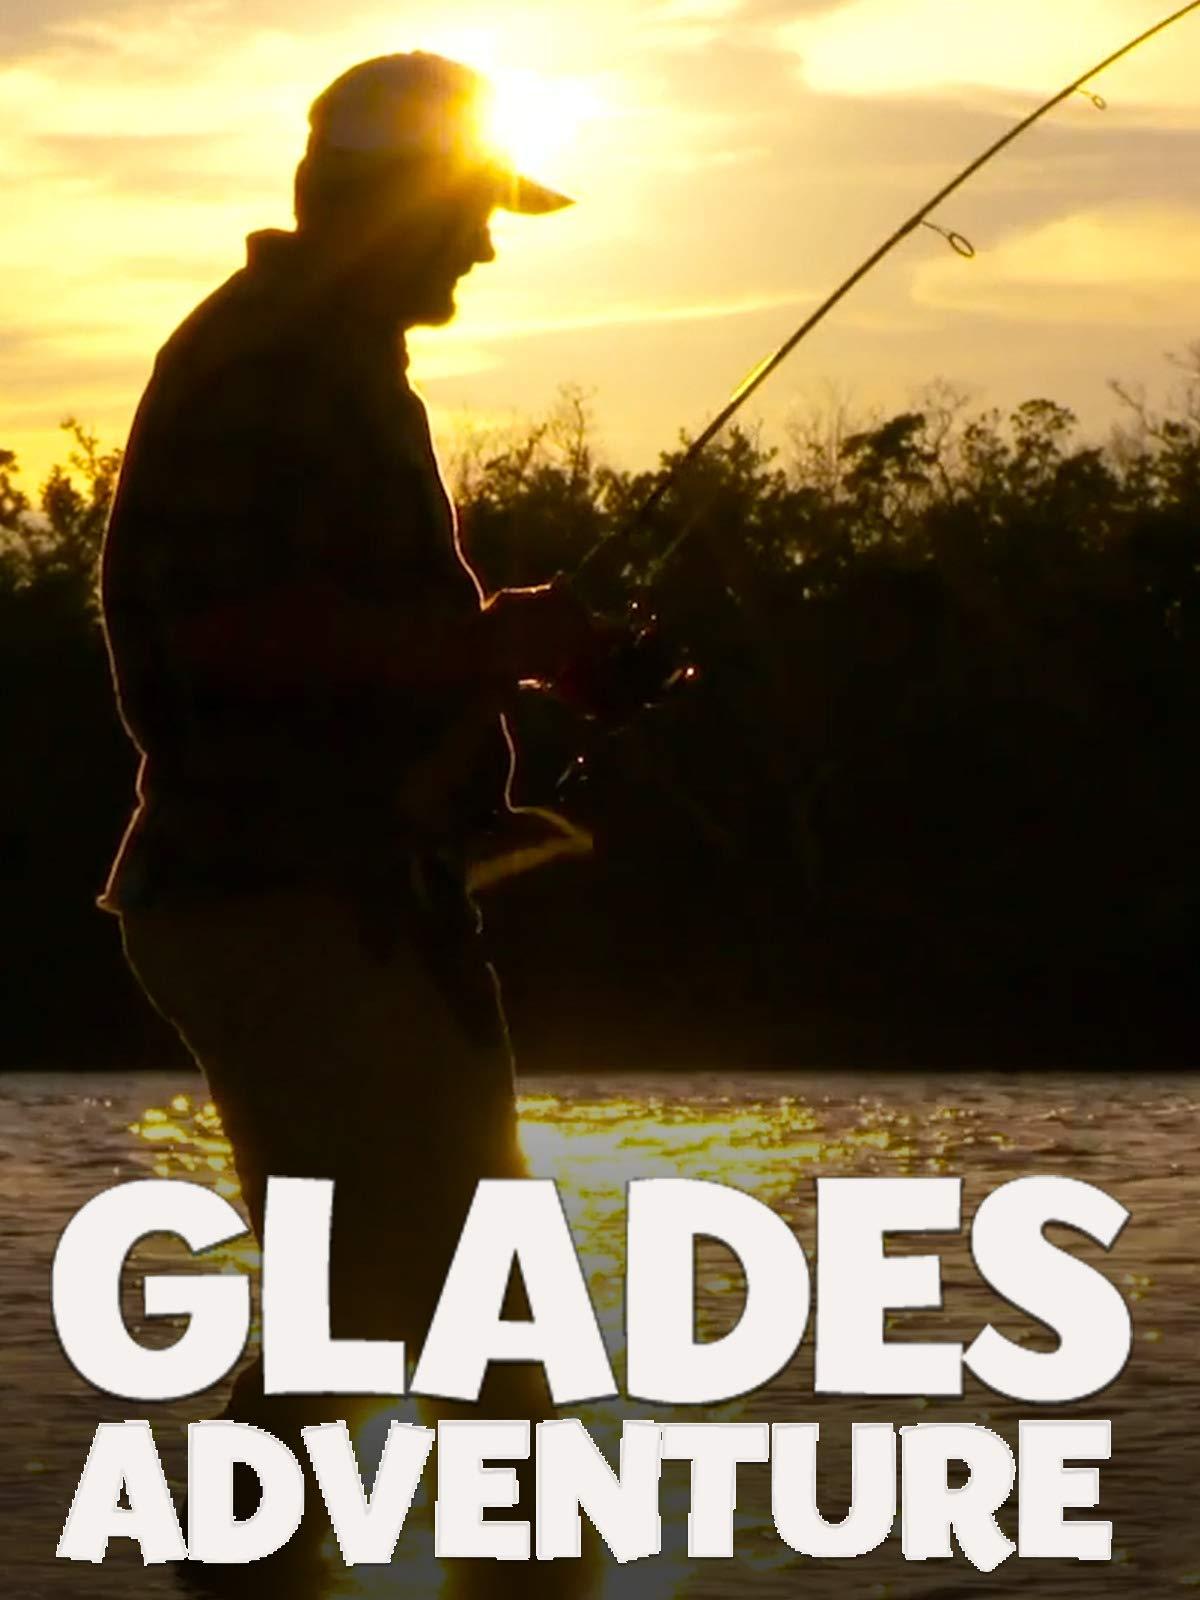 Clip: Glades Adventure